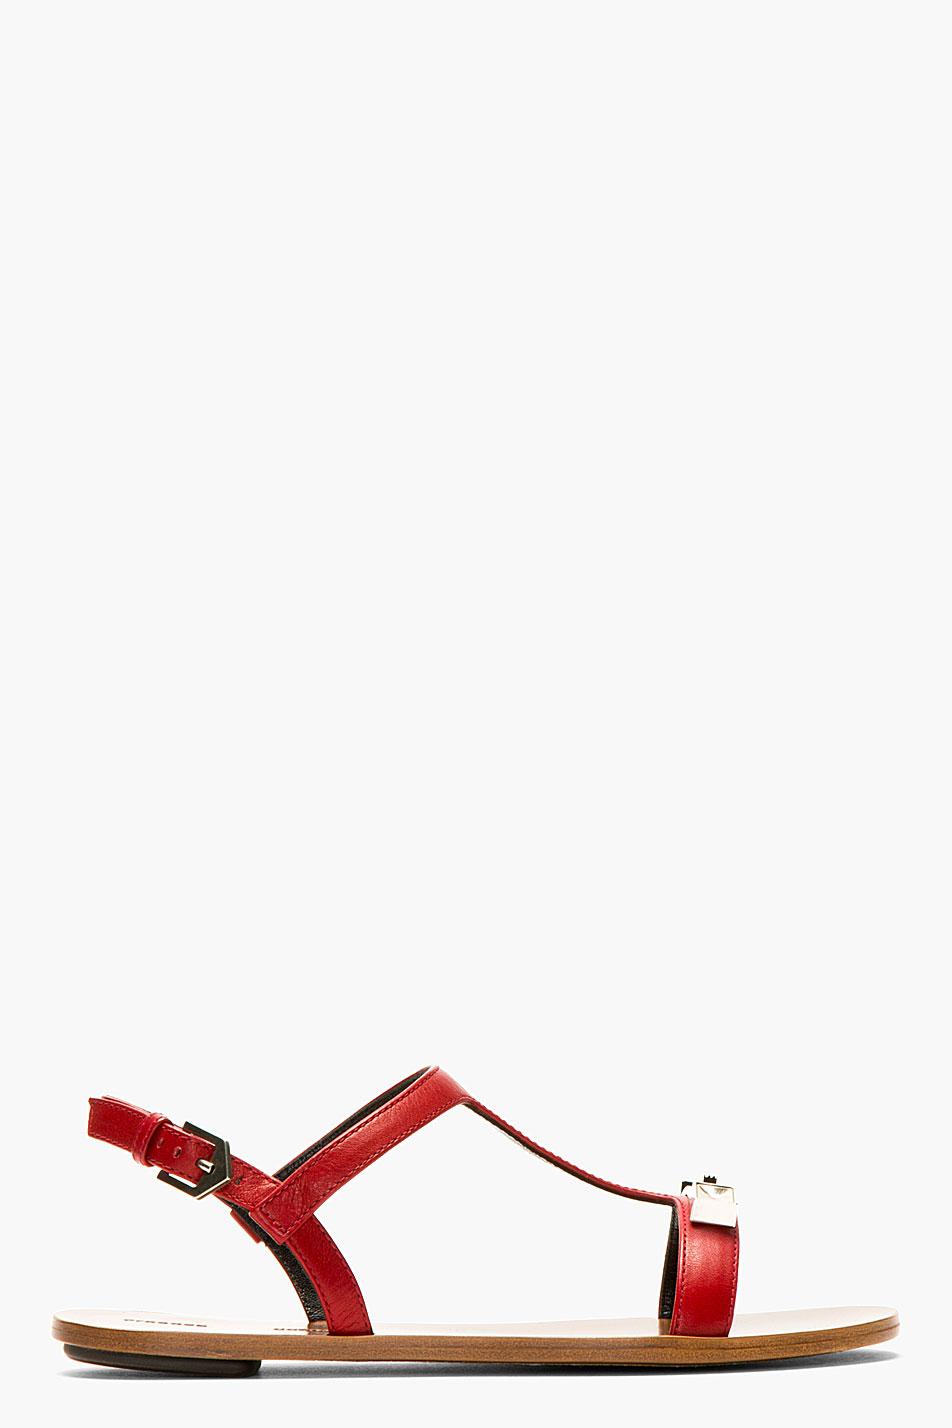 Proenza schouler crimson leather flat sandals